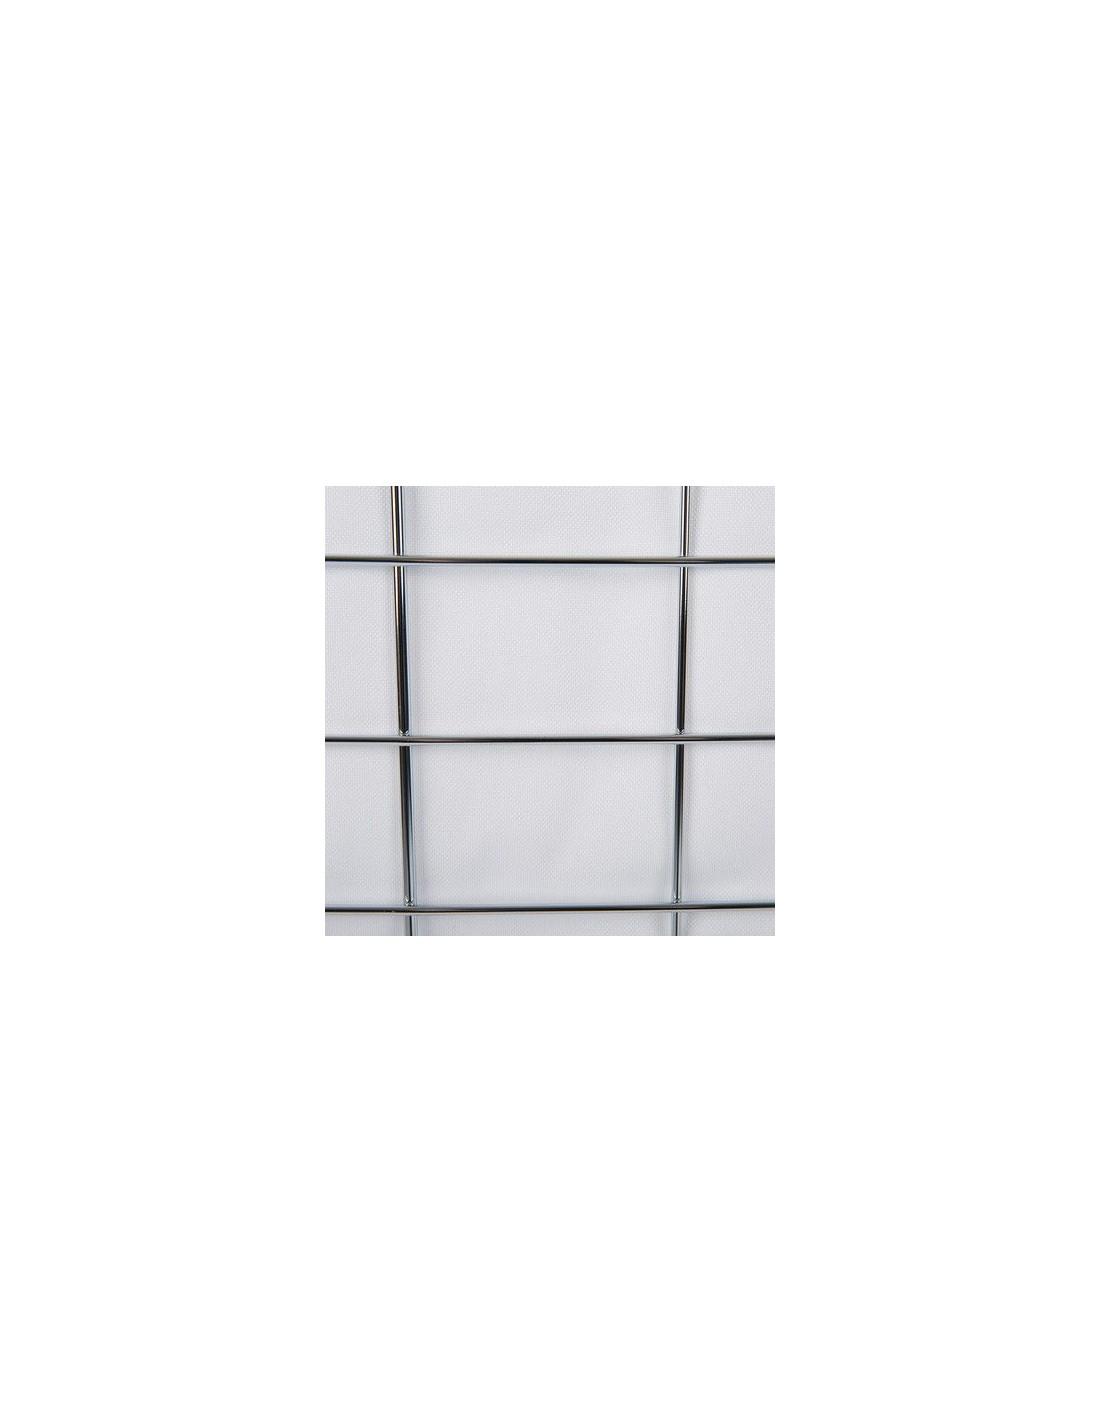 panier linge nsfp nylon blanc decor walther. Black Bedroom Furniture Sets. Home Design Ideas